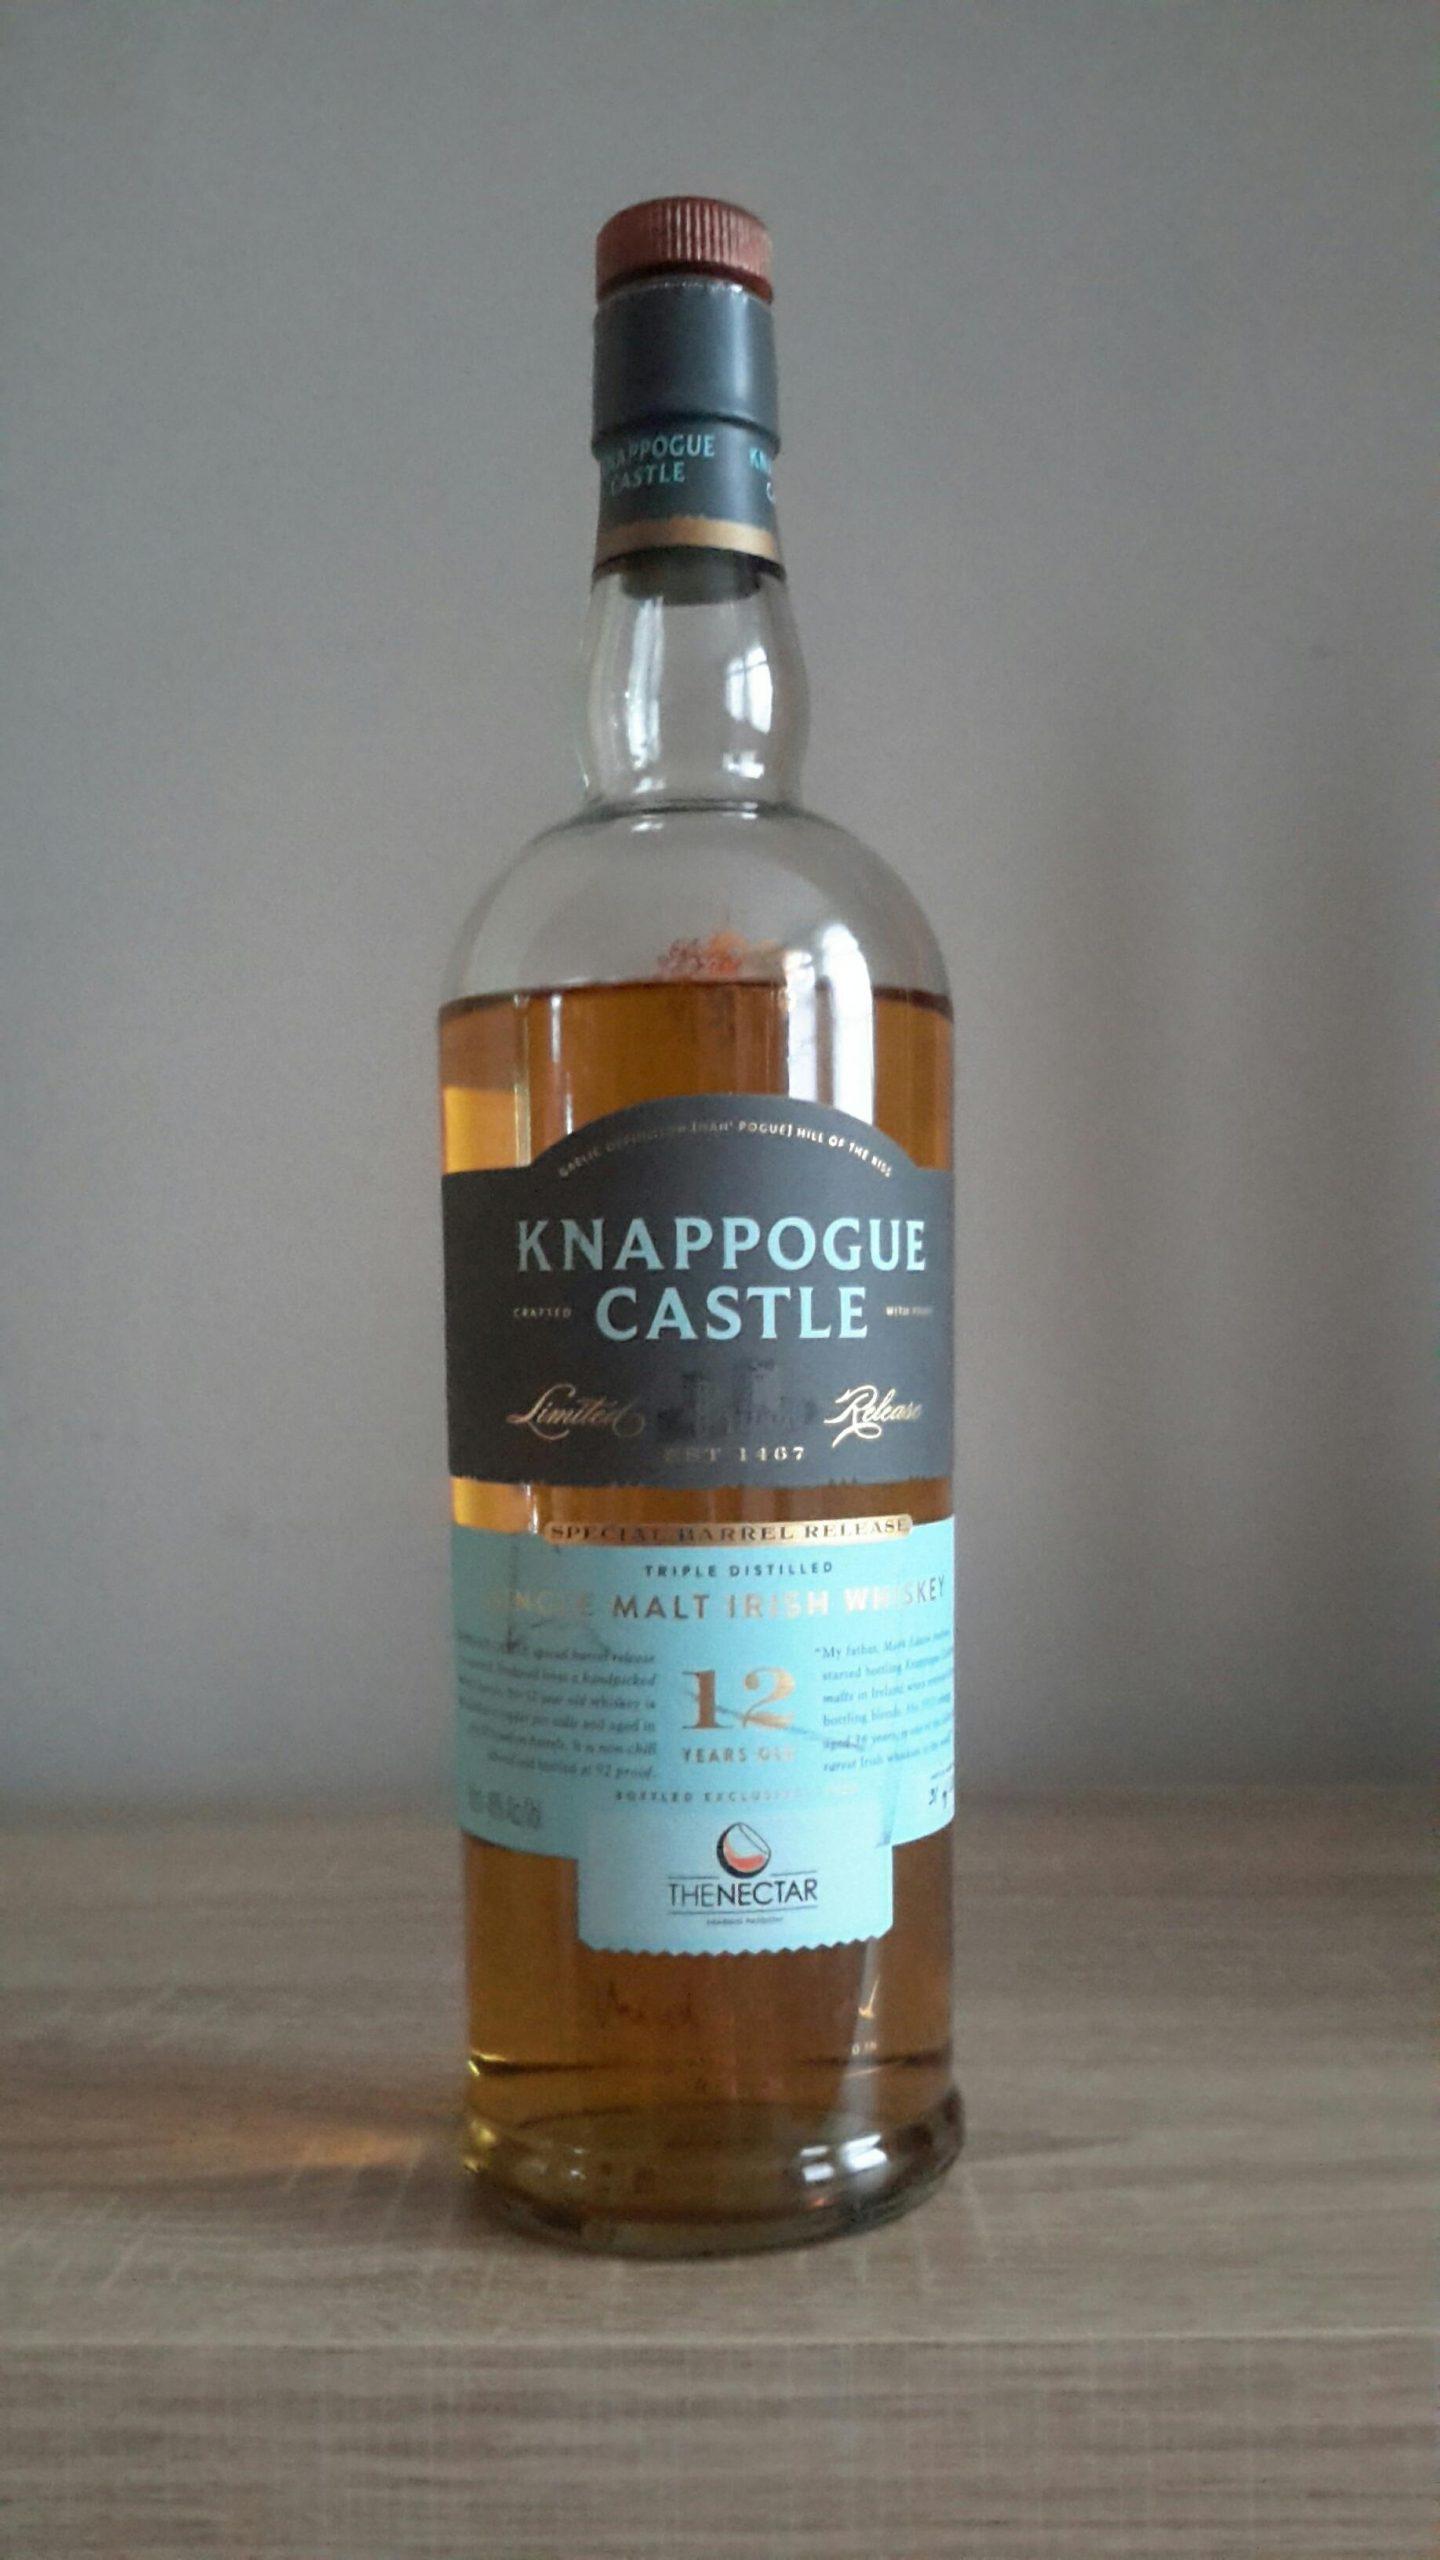 Knappogue Castle Special Barrel Release